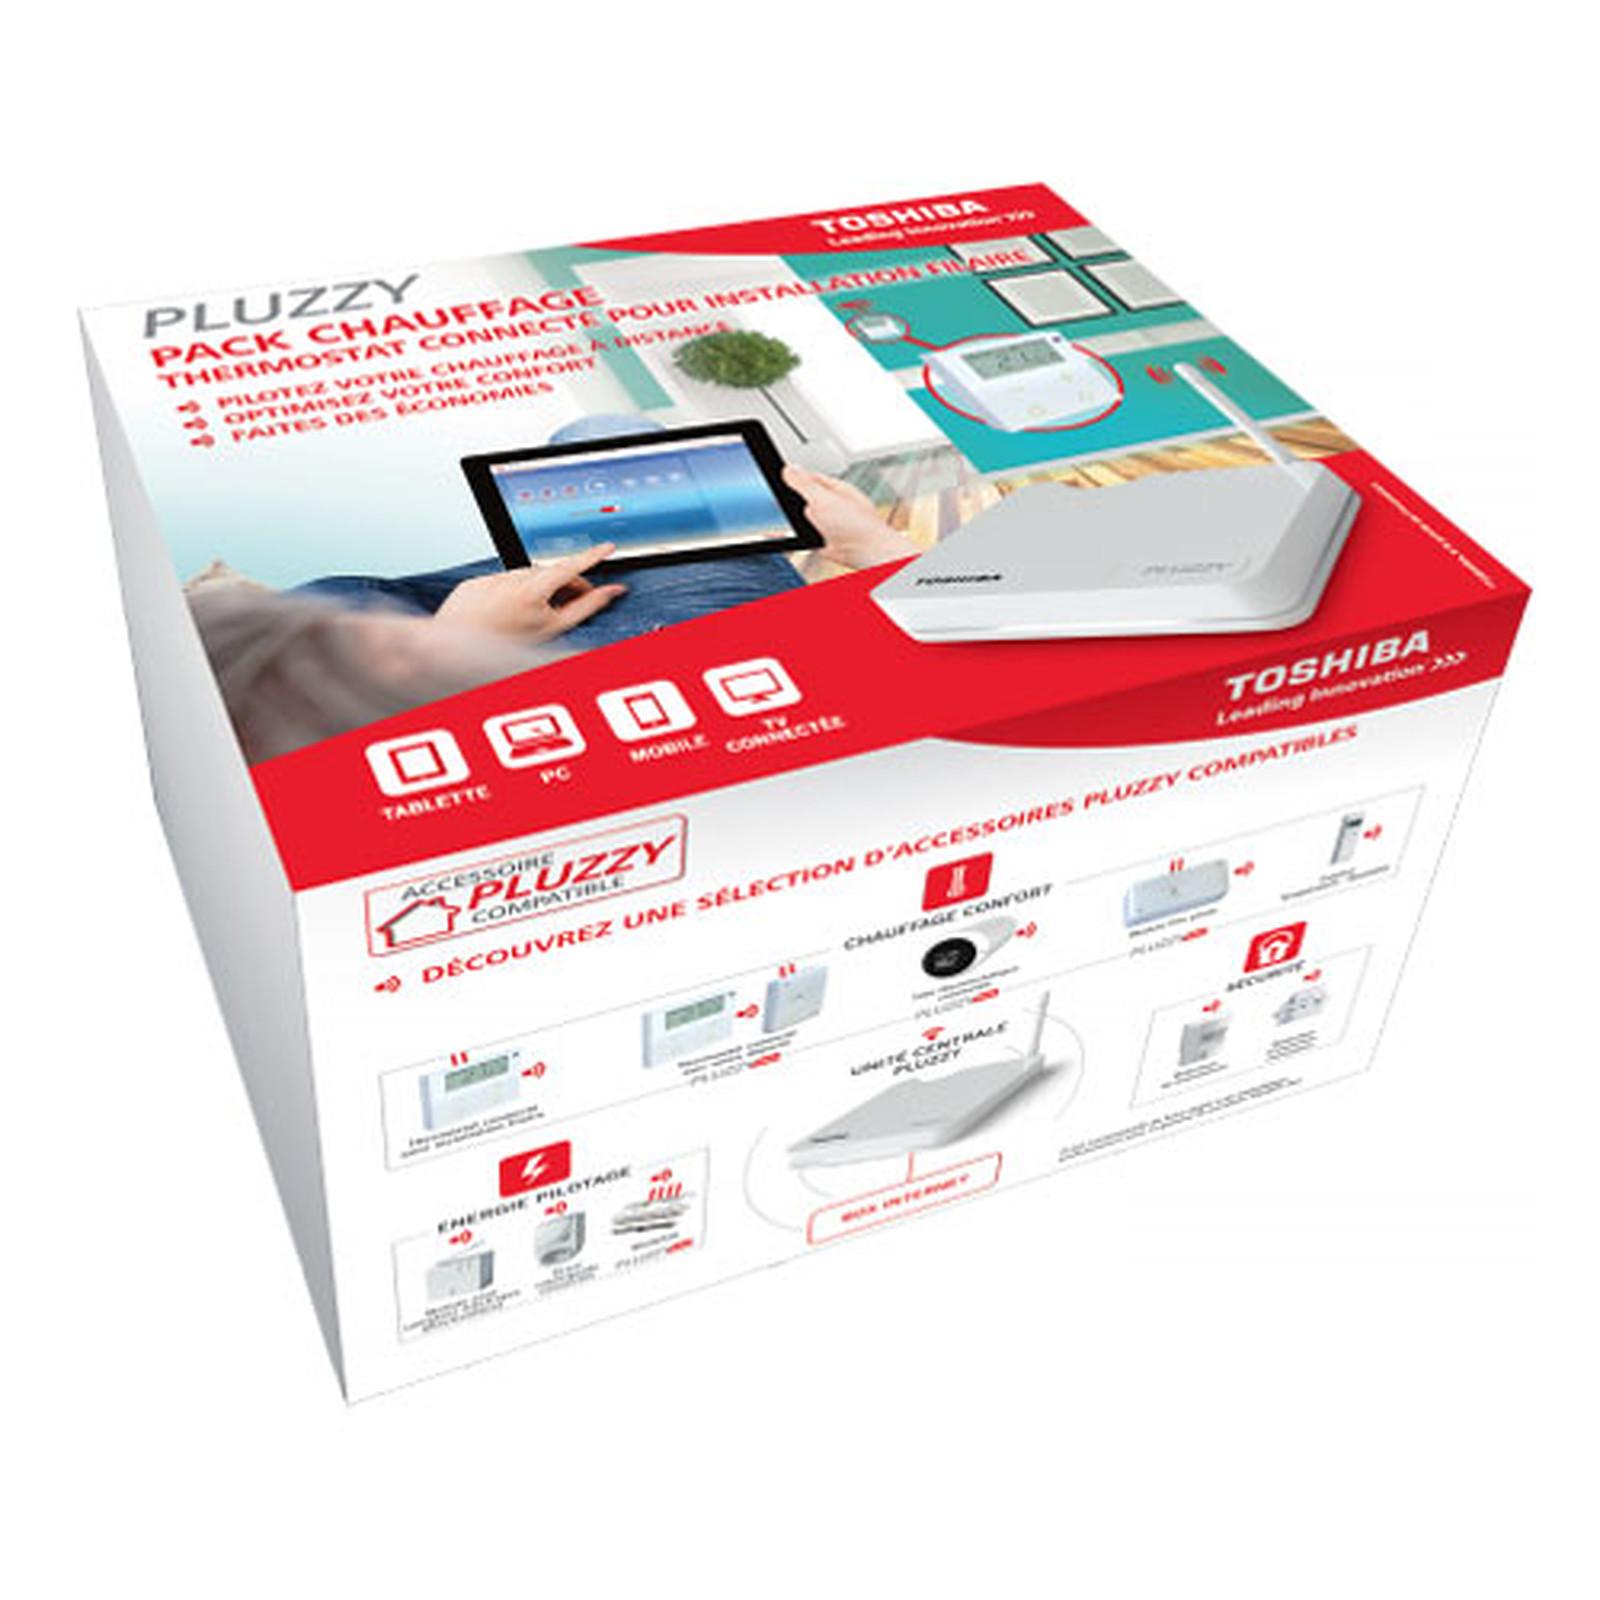 Toshiba Pluzzy Pack Chauffage